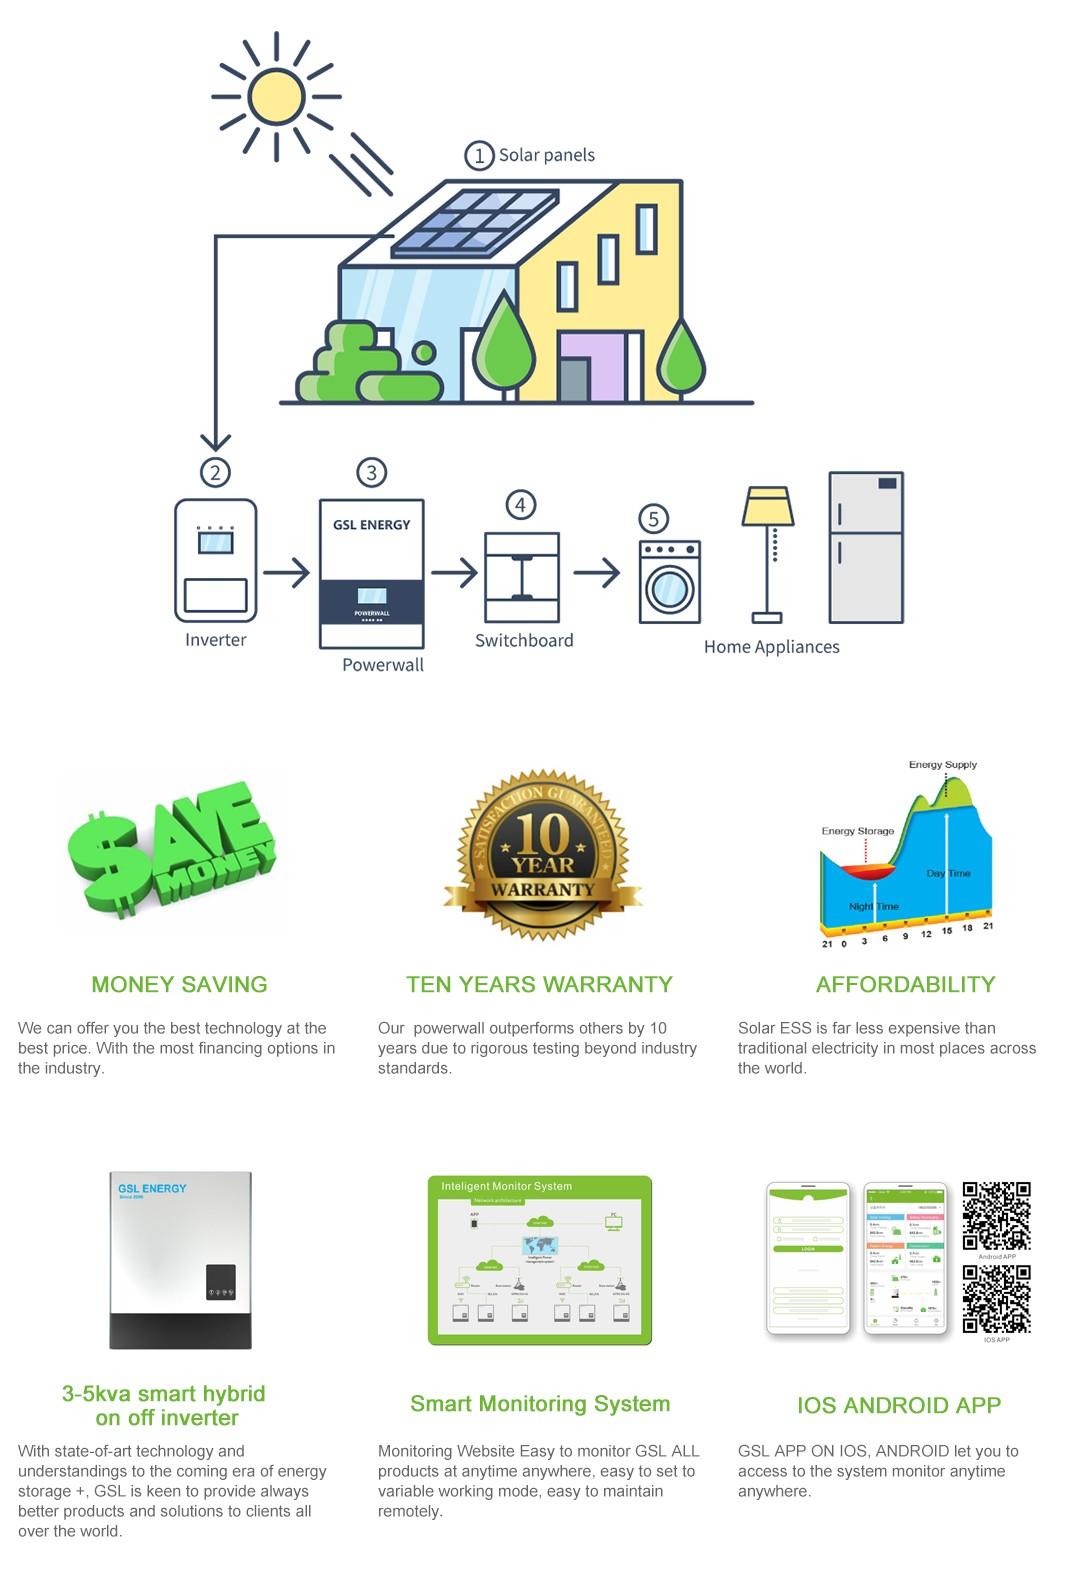 product-Wall Mounted Lifepo4 7Kwh Tesla Powerwall Home Battery Storage-GSL ENERGY-img